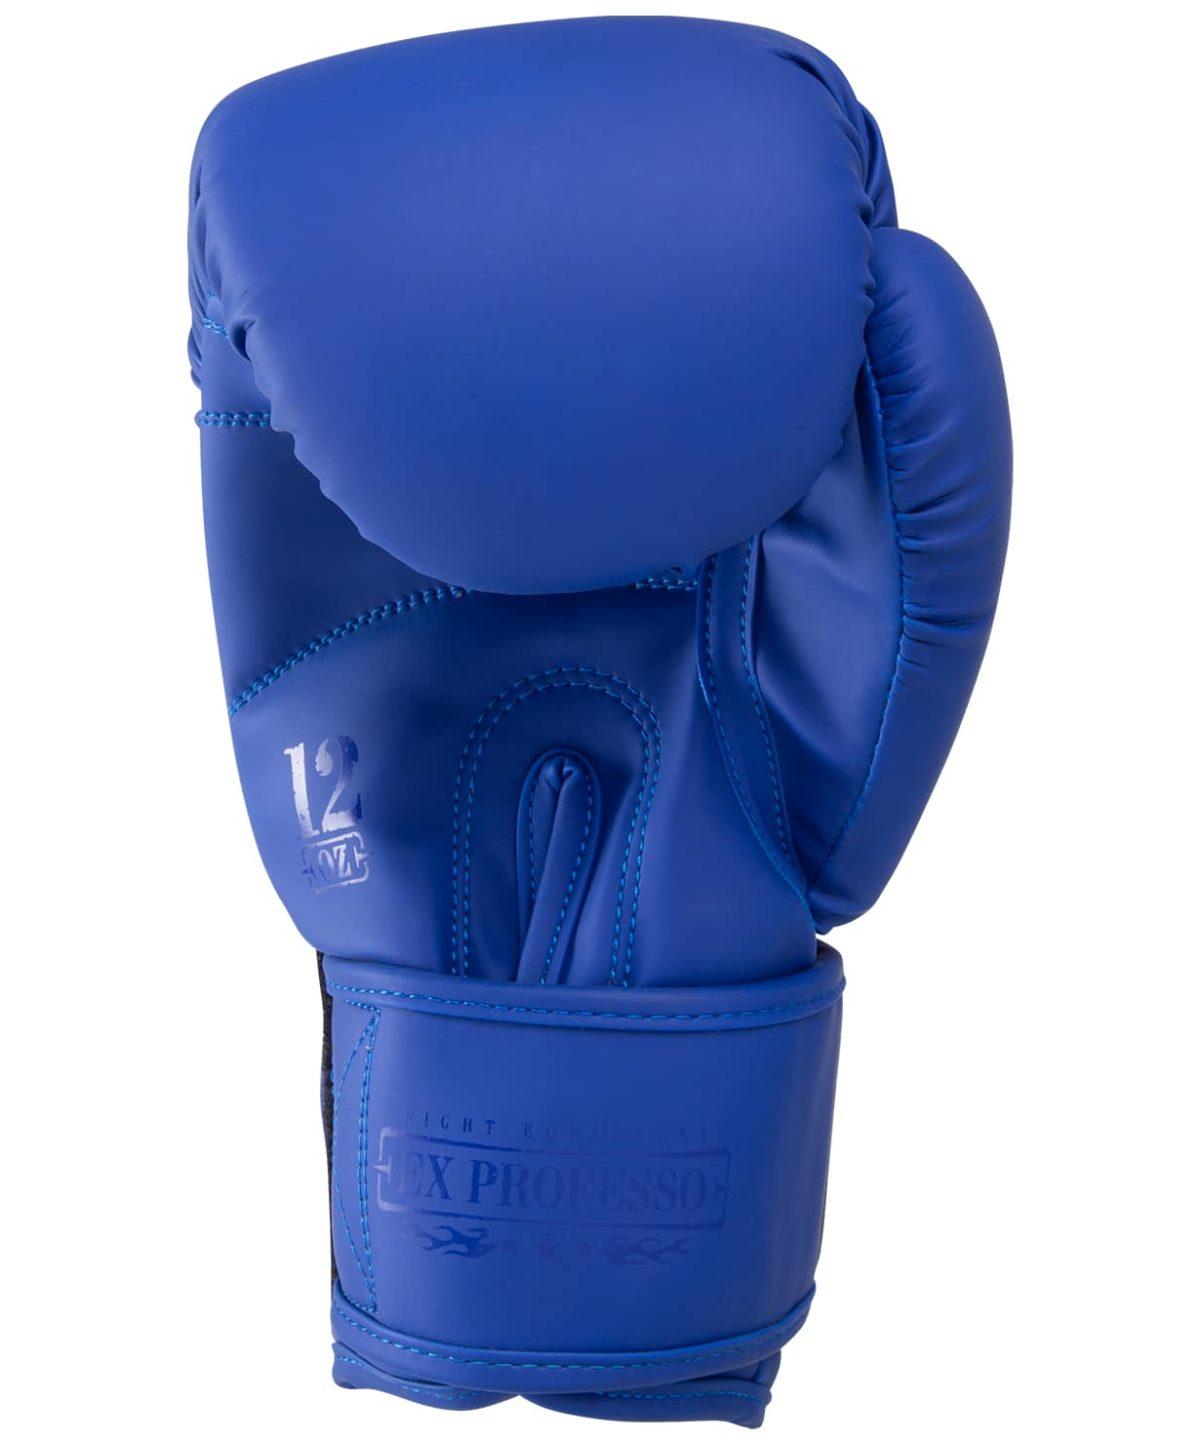 FIGHT EXPERT Перчатки боксерские 10 oz  BGS-V010: синий - 4